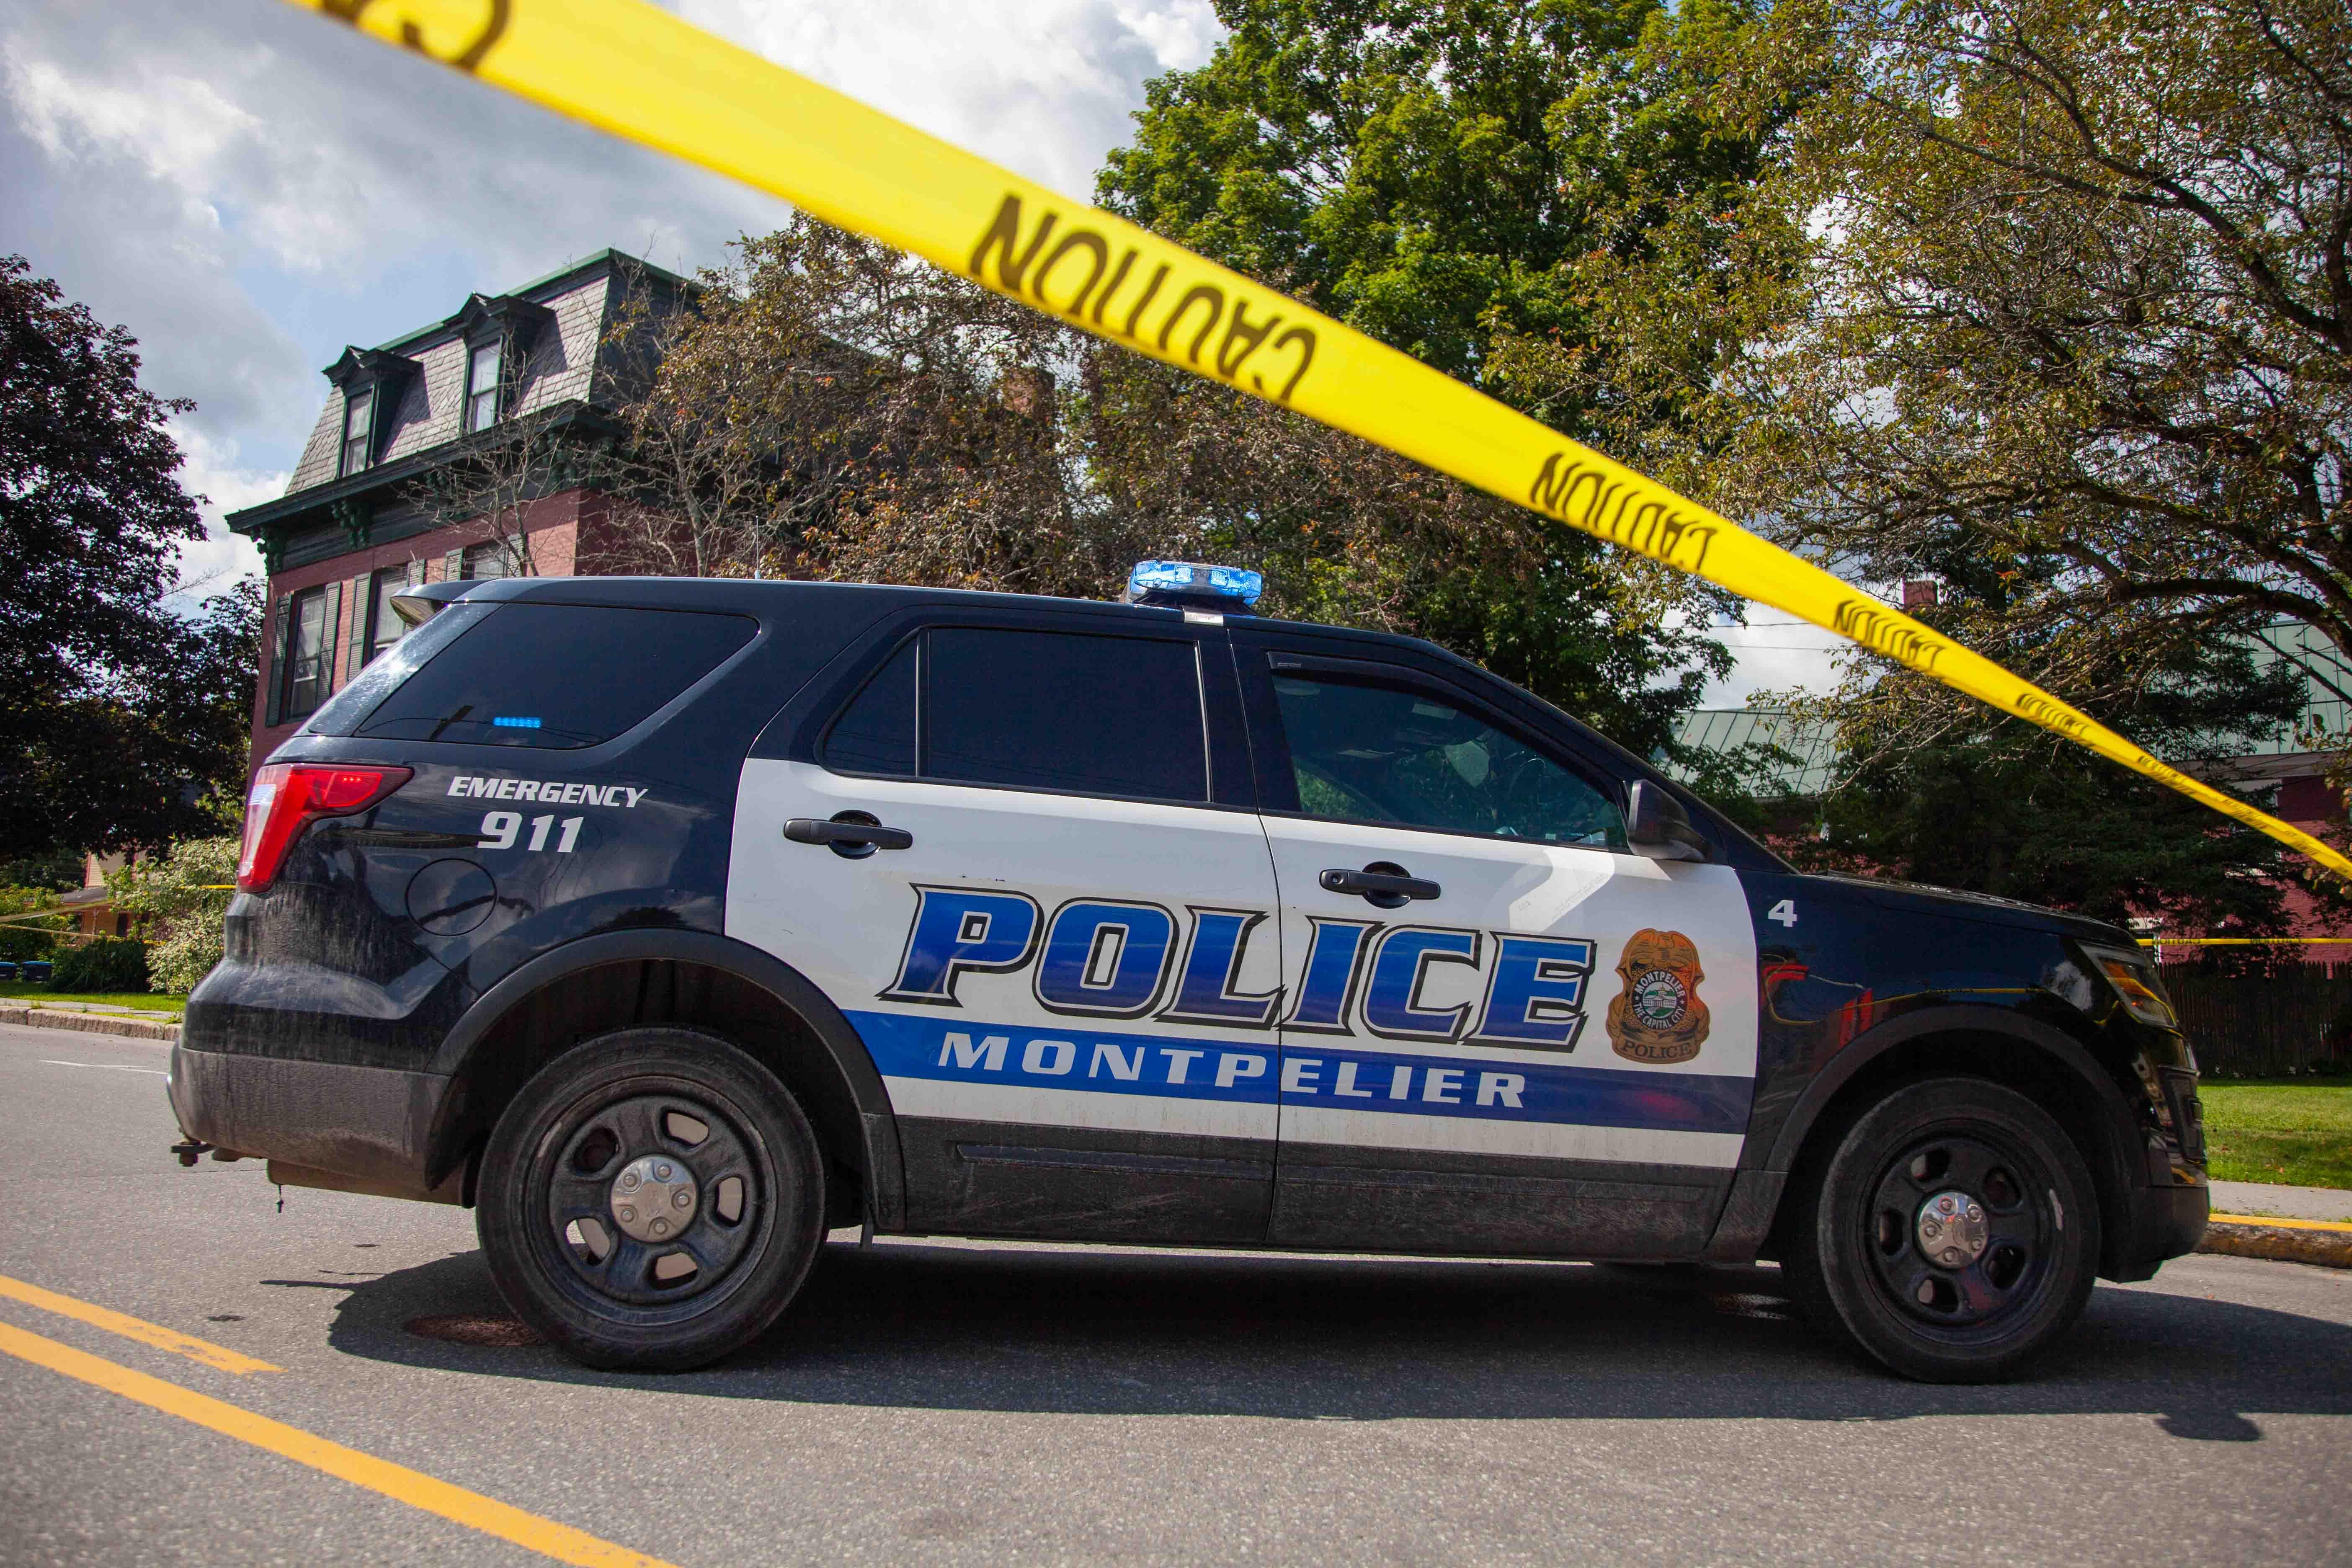 Police Issue VT Police Taser